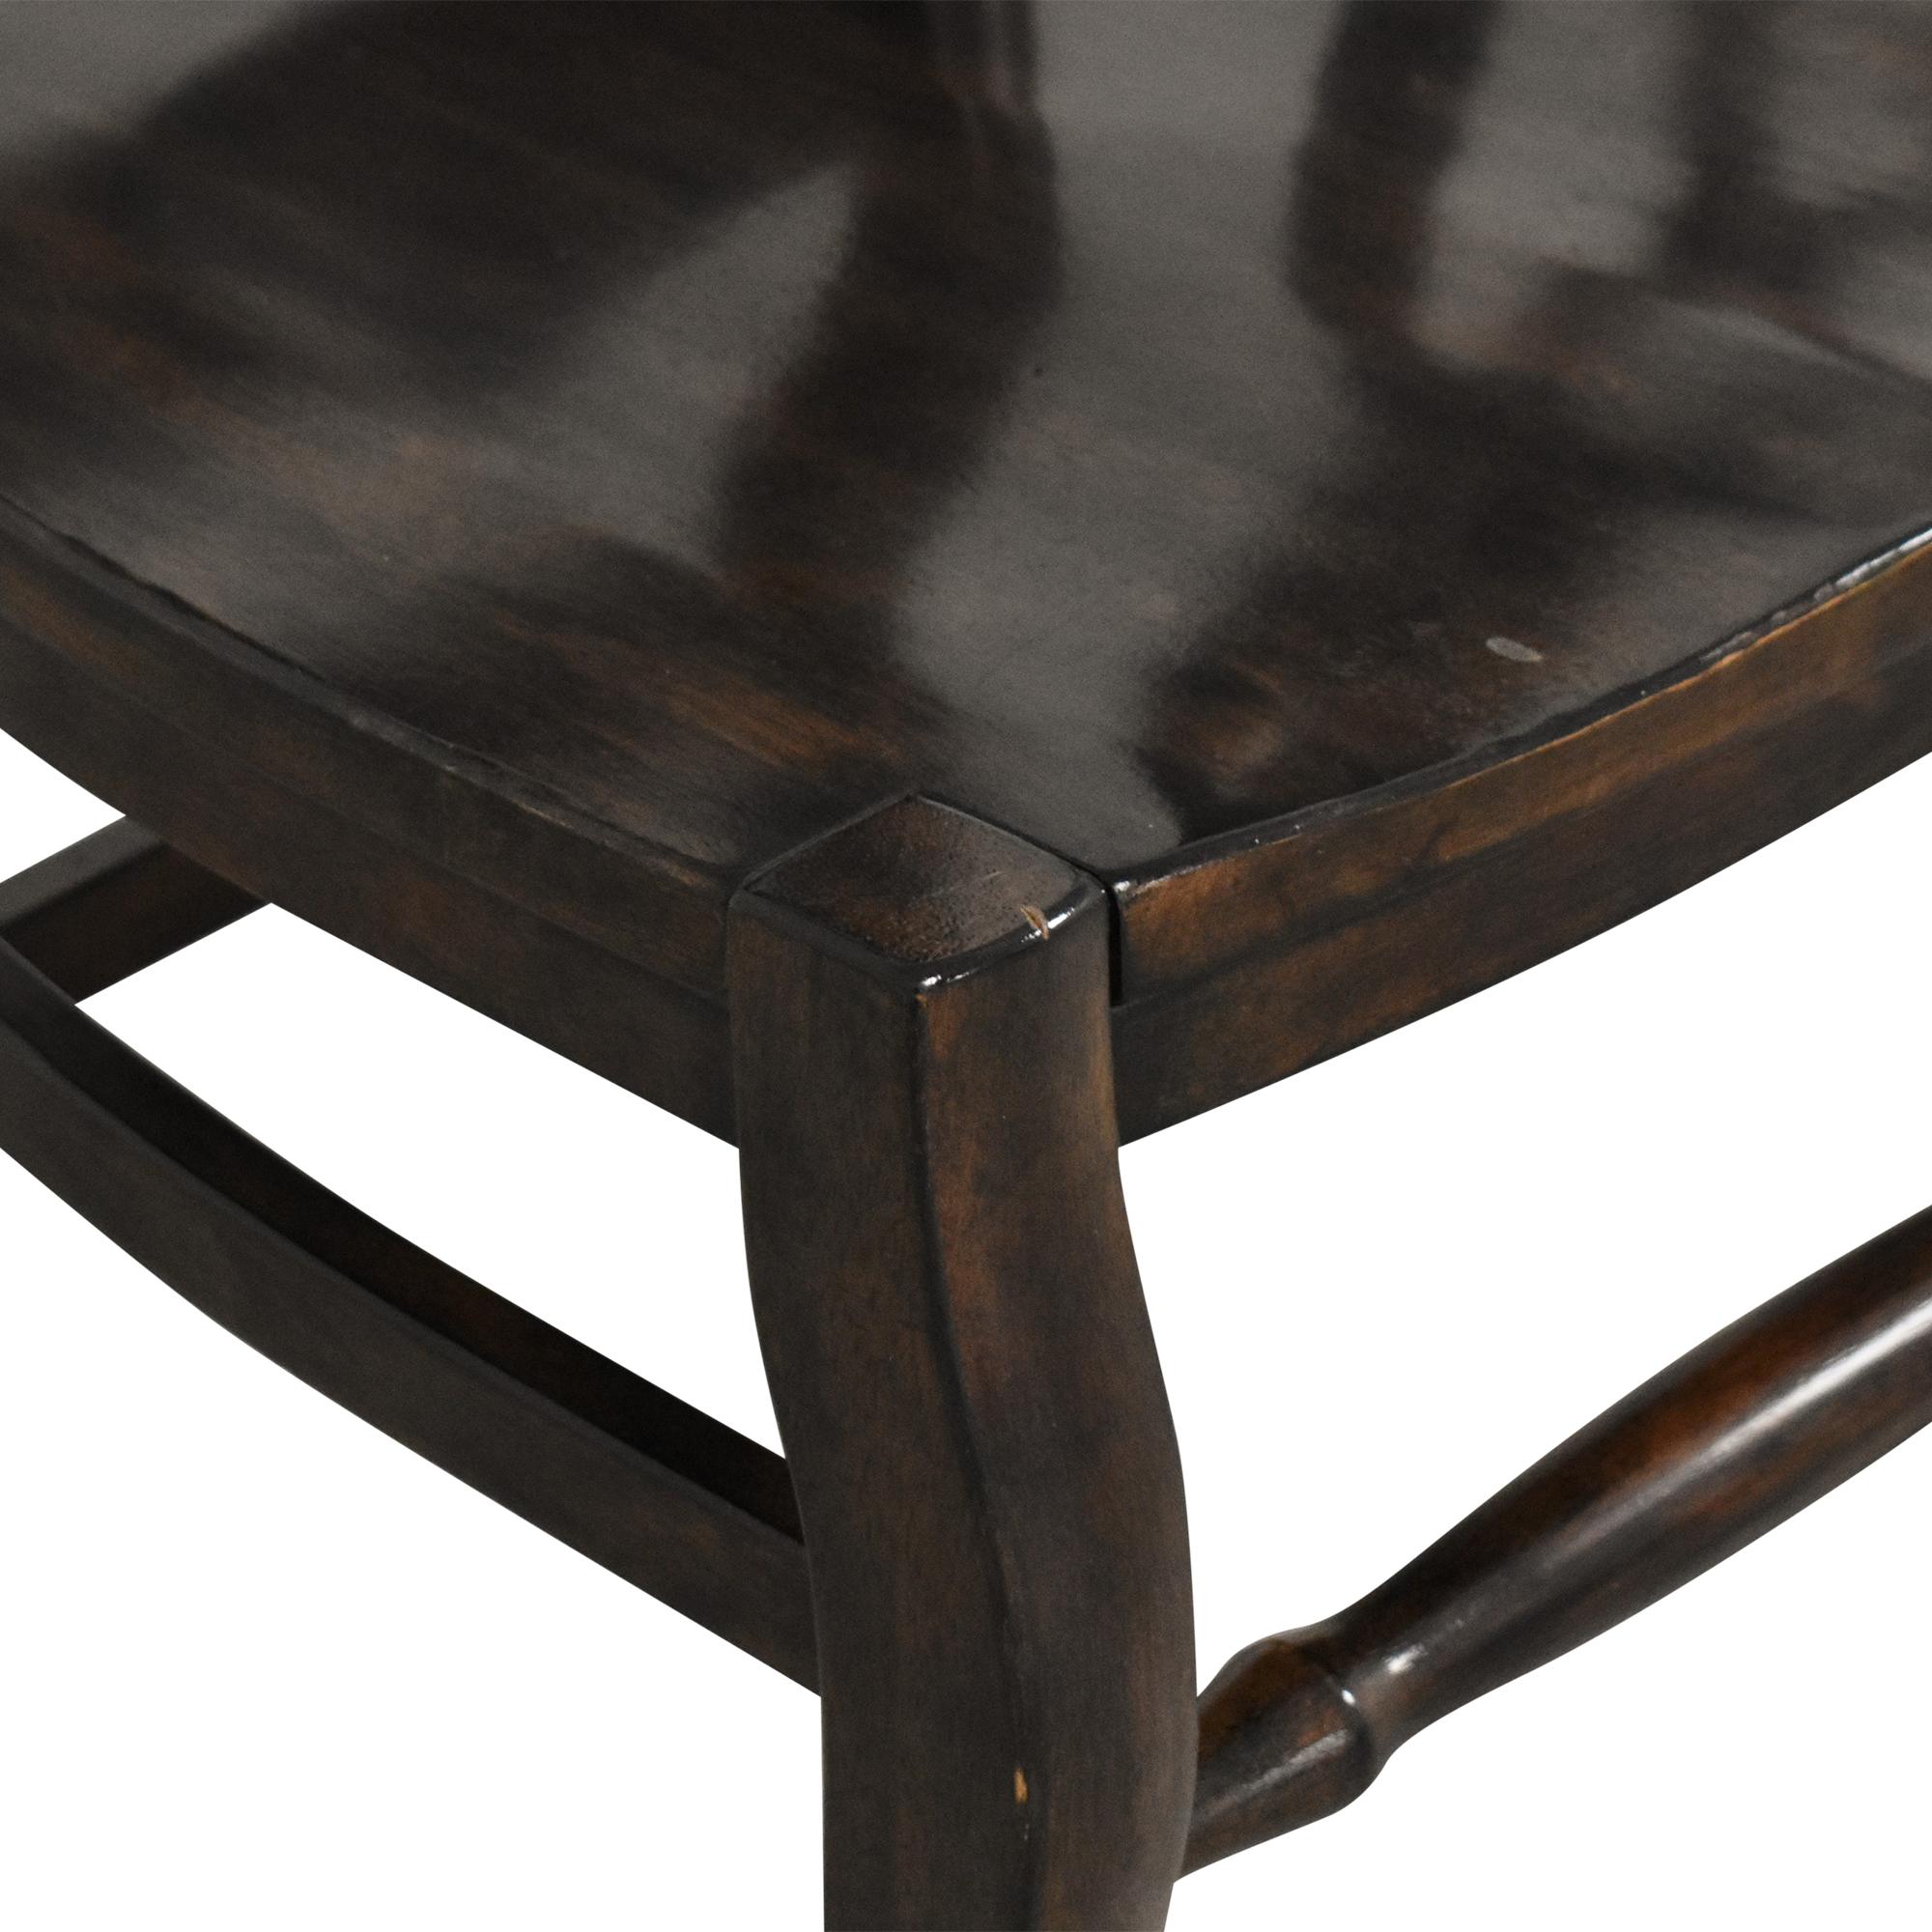 buy Pottery Barn Aaron and Wynn Ladderback Dining Chairs Pottery Barn Dining Chairs